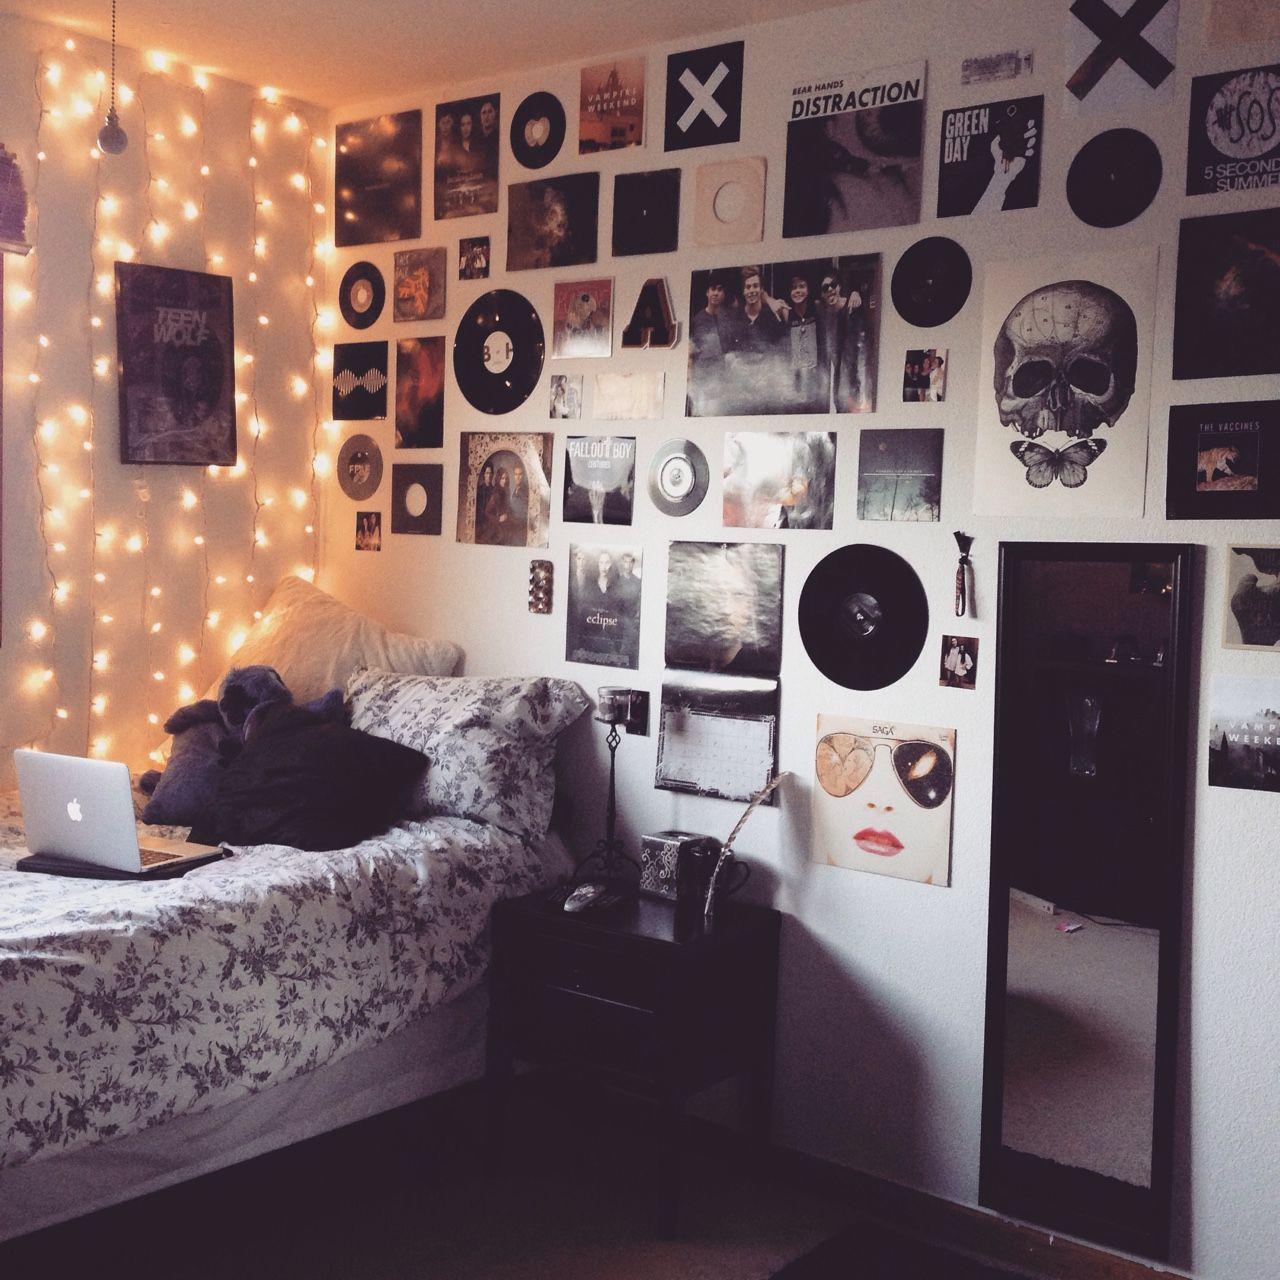 25 incre bles ideas que te har n inspirarte para decorar tu dormitorio nuevo usuario pinterest - Decorar album de fotos por dentro ...